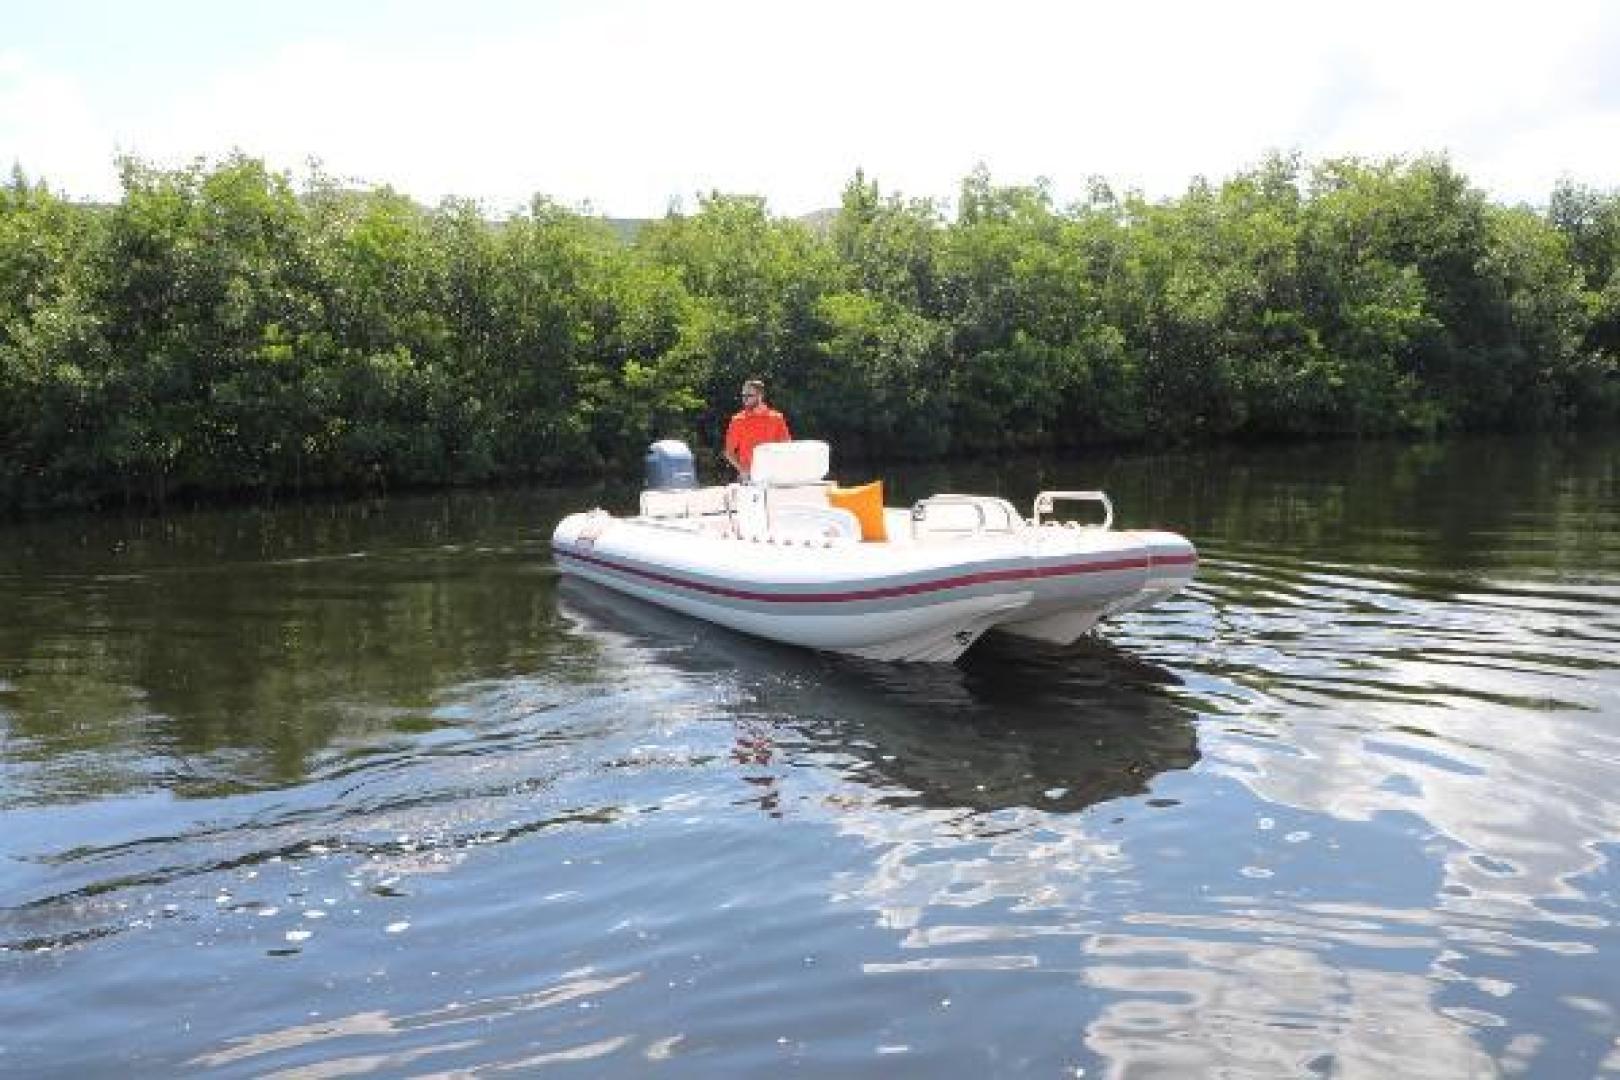 Novurania-Catamaran 24 2017-Novurania Catamaran 24 Fort Lauderdale-Florida-United States-1530842   Thumbnail